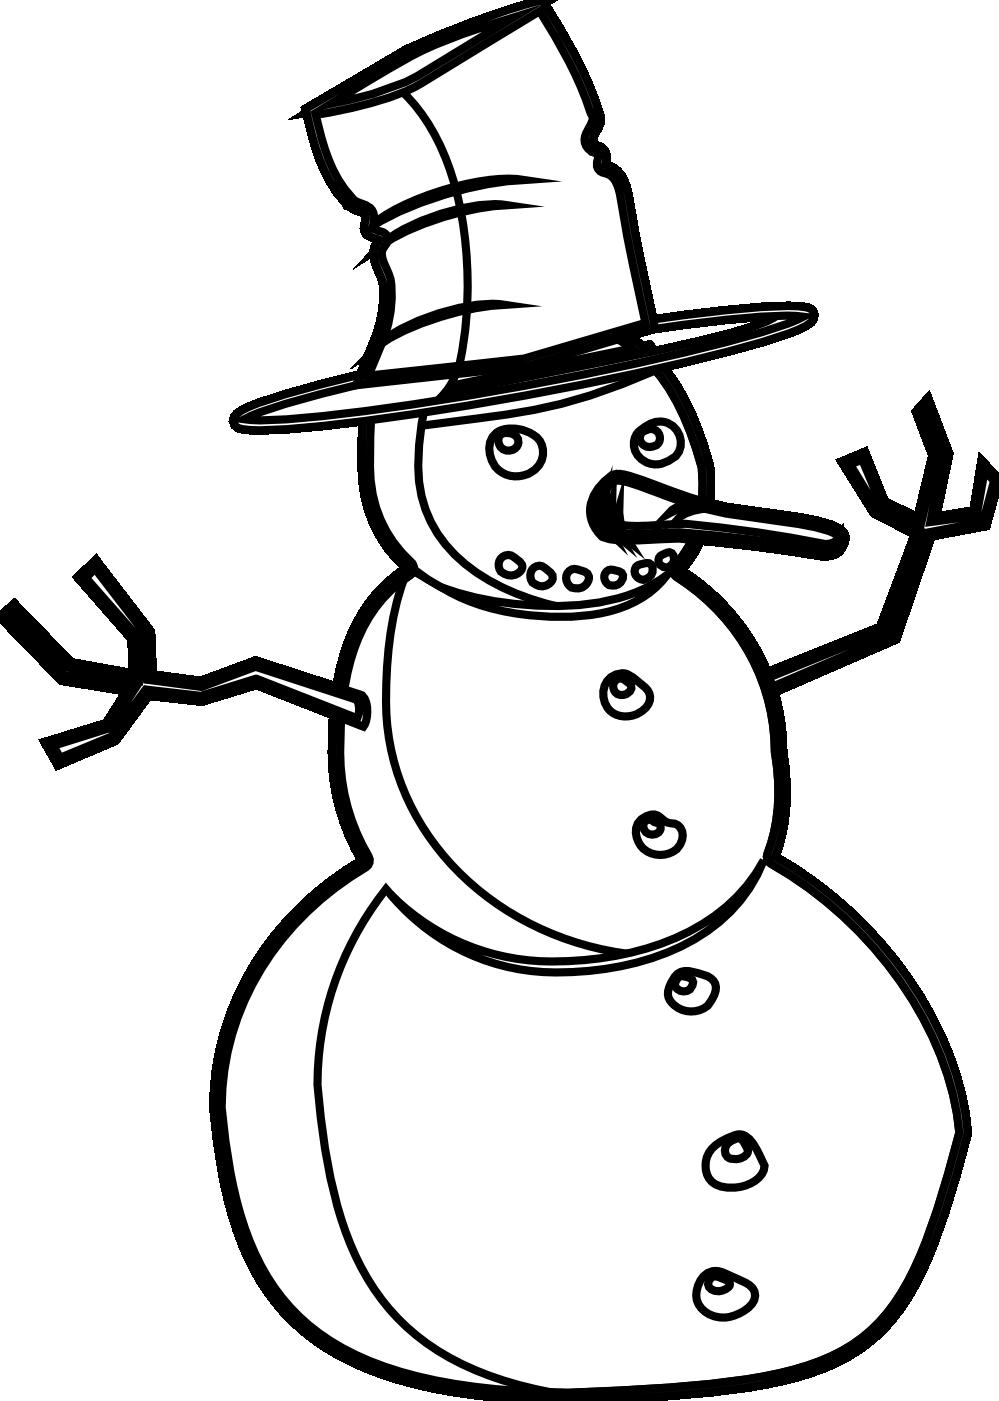 Coal clipart snowman. Making a amazing kids